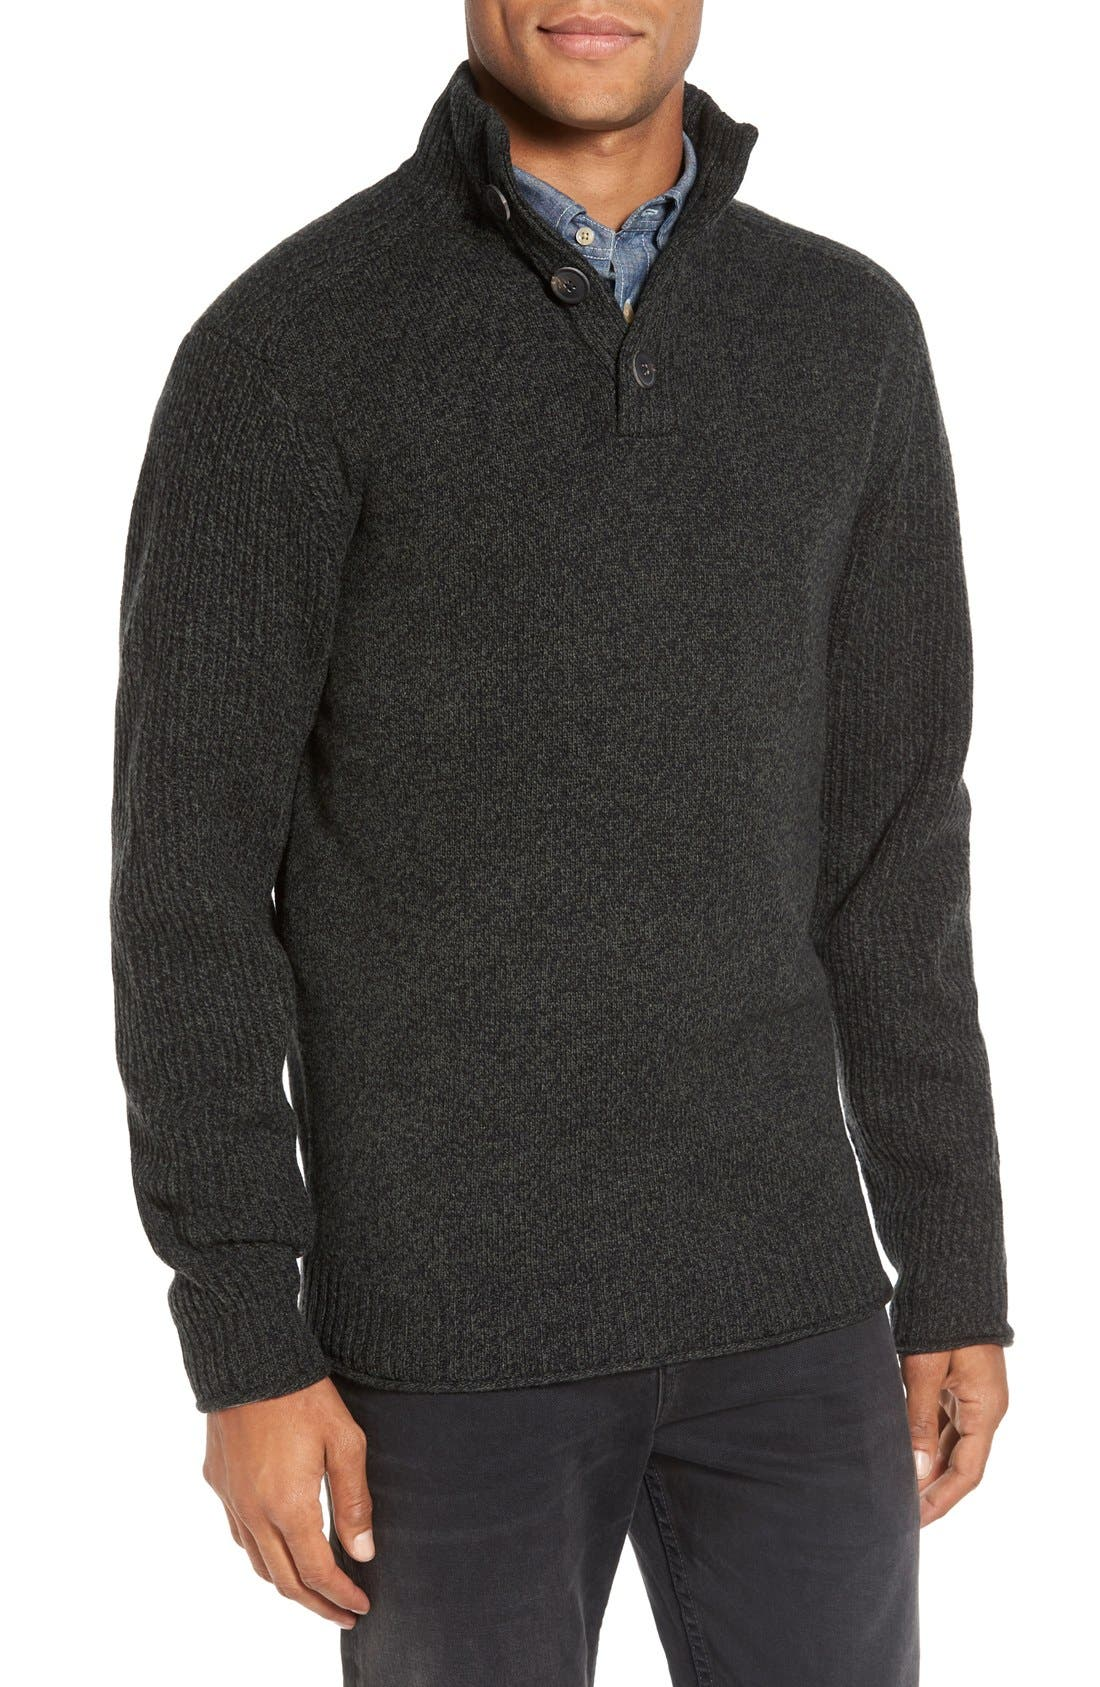 Main Image - Rodd & Gunn Birkenhead Mock Neck Sweater